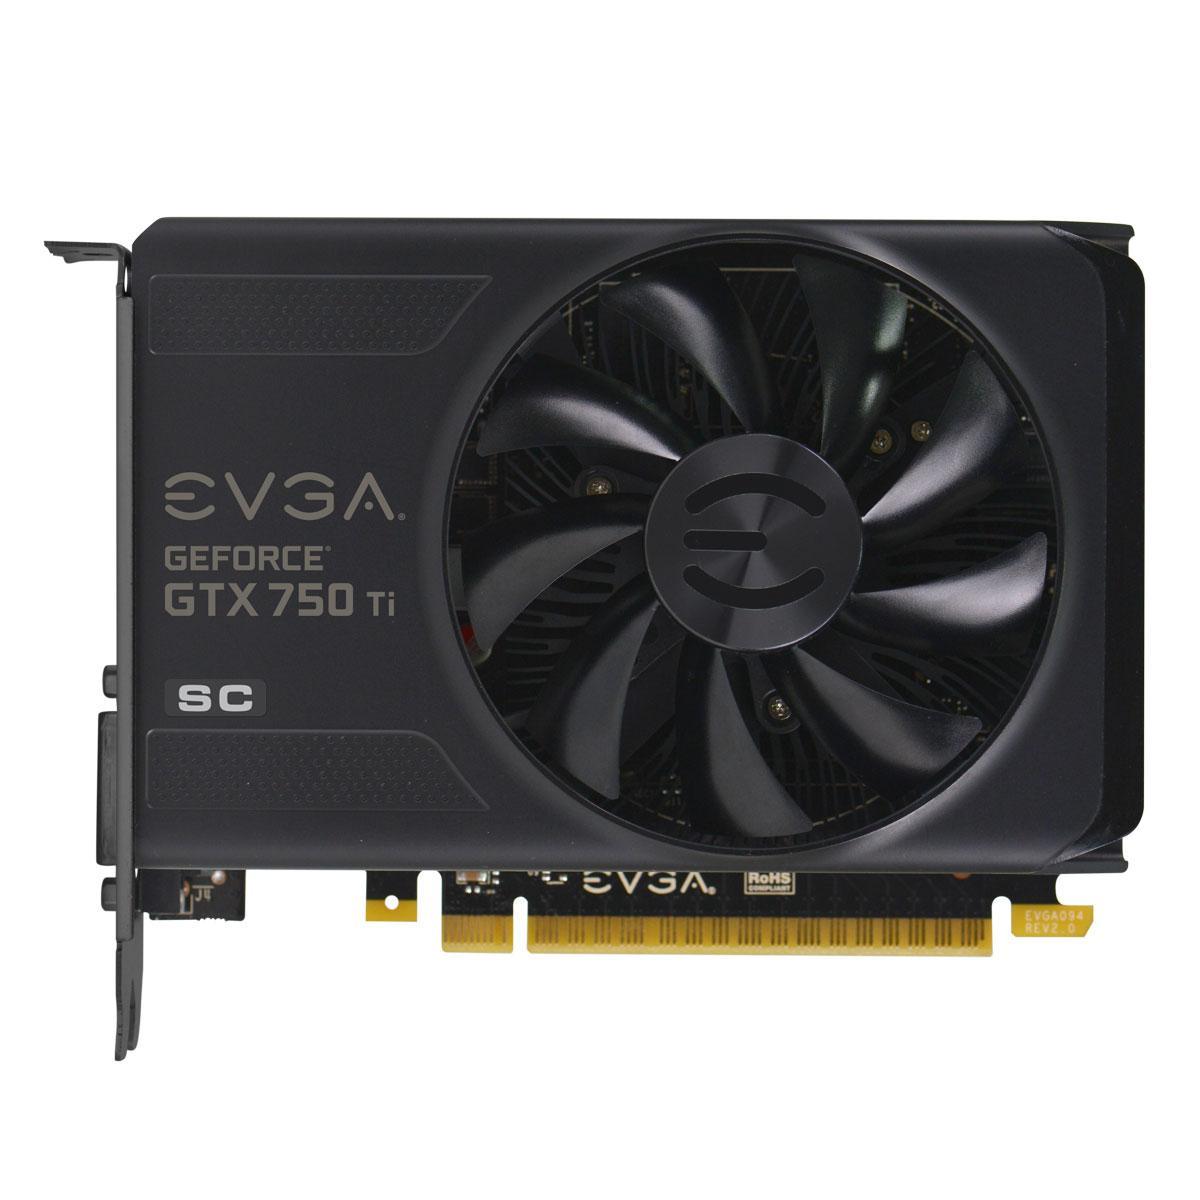 Amazon.com: EVGA GeForce GTX 750Ti SC 2GB GDDR5 Graphics